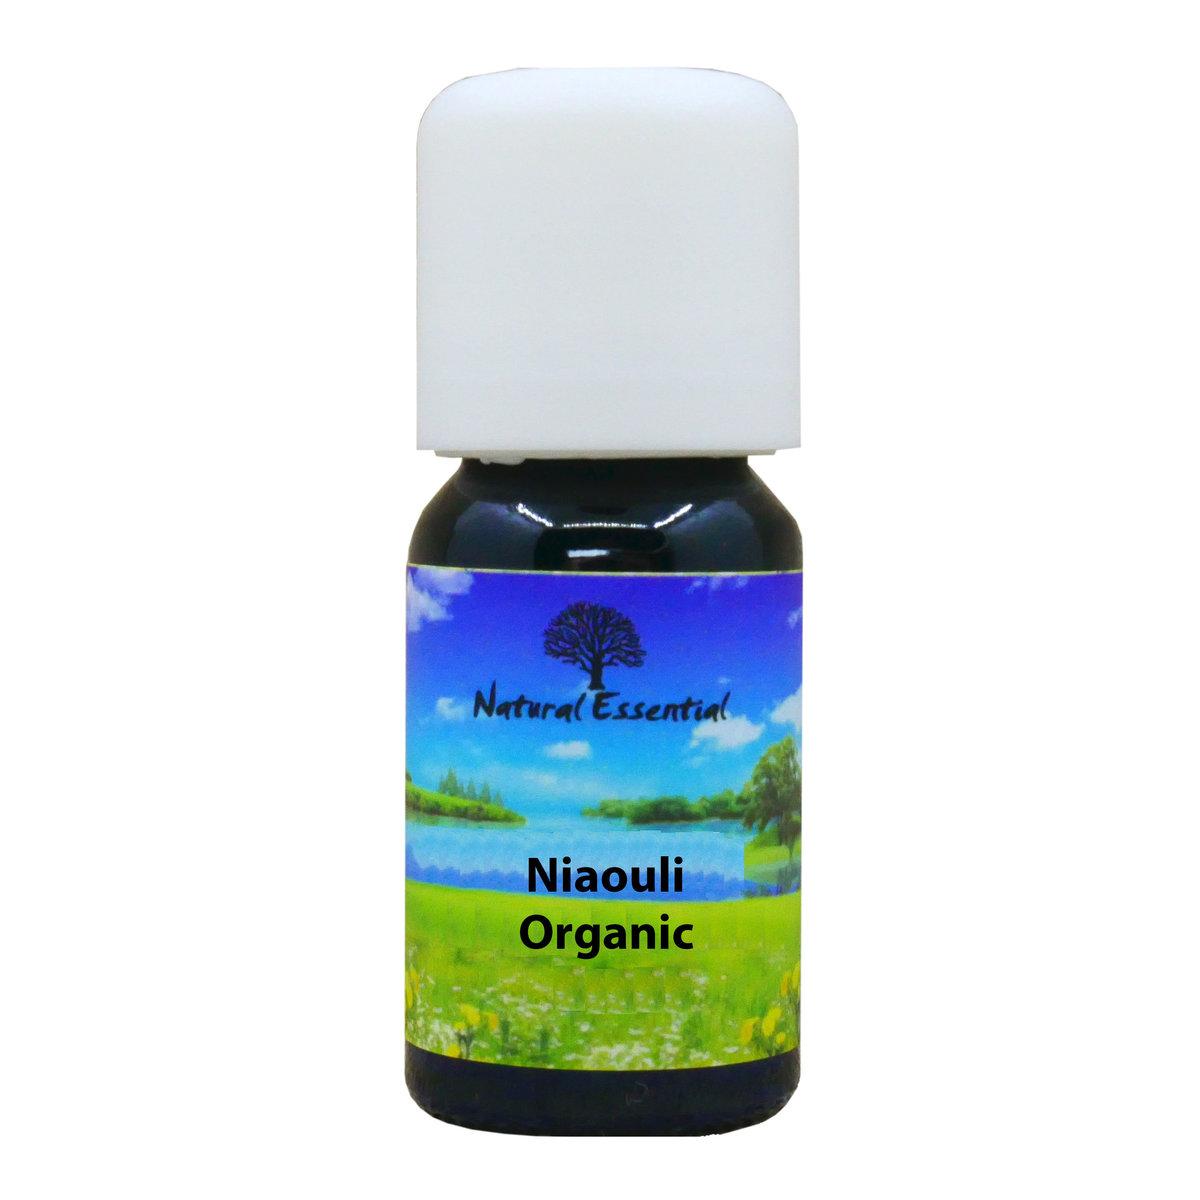 Niaouli, Organic 有機綠花白千層精油 (法國)